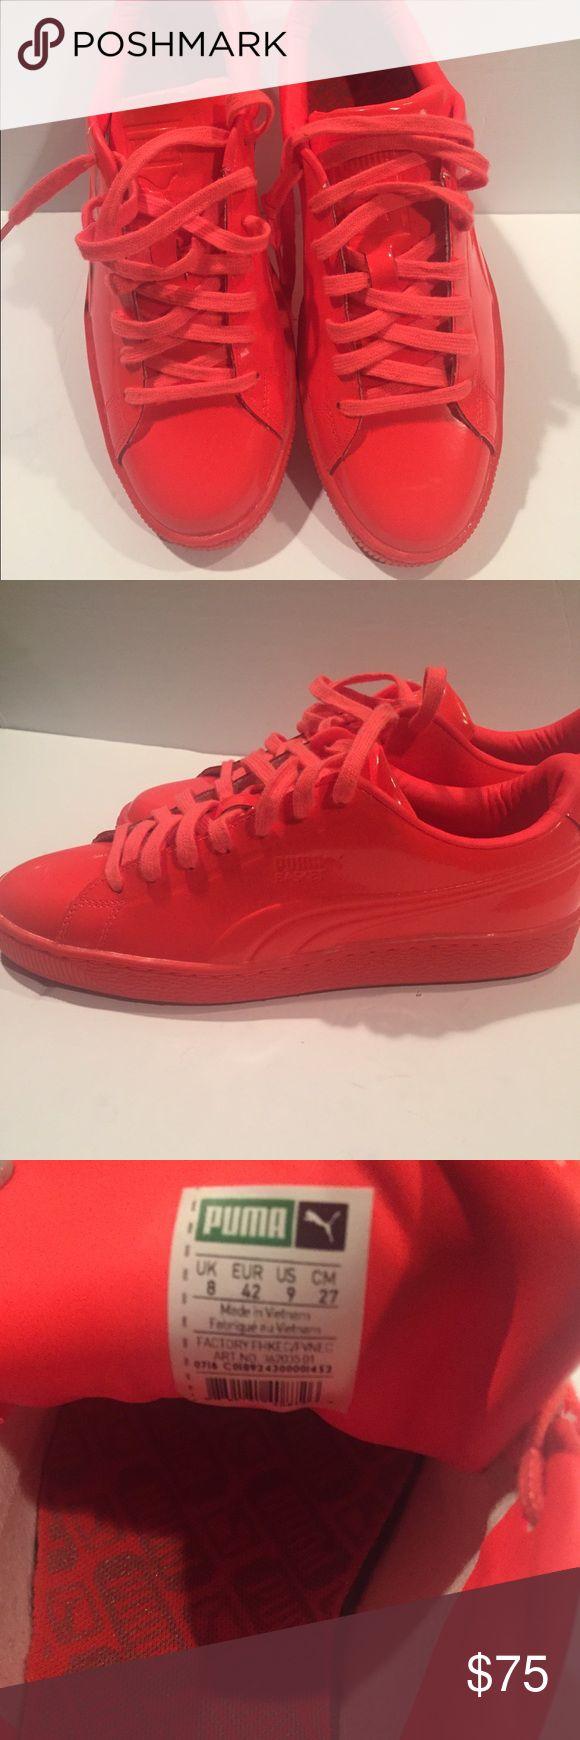 ec182b364291 puma footy boots on sale   OFF64% Discounts